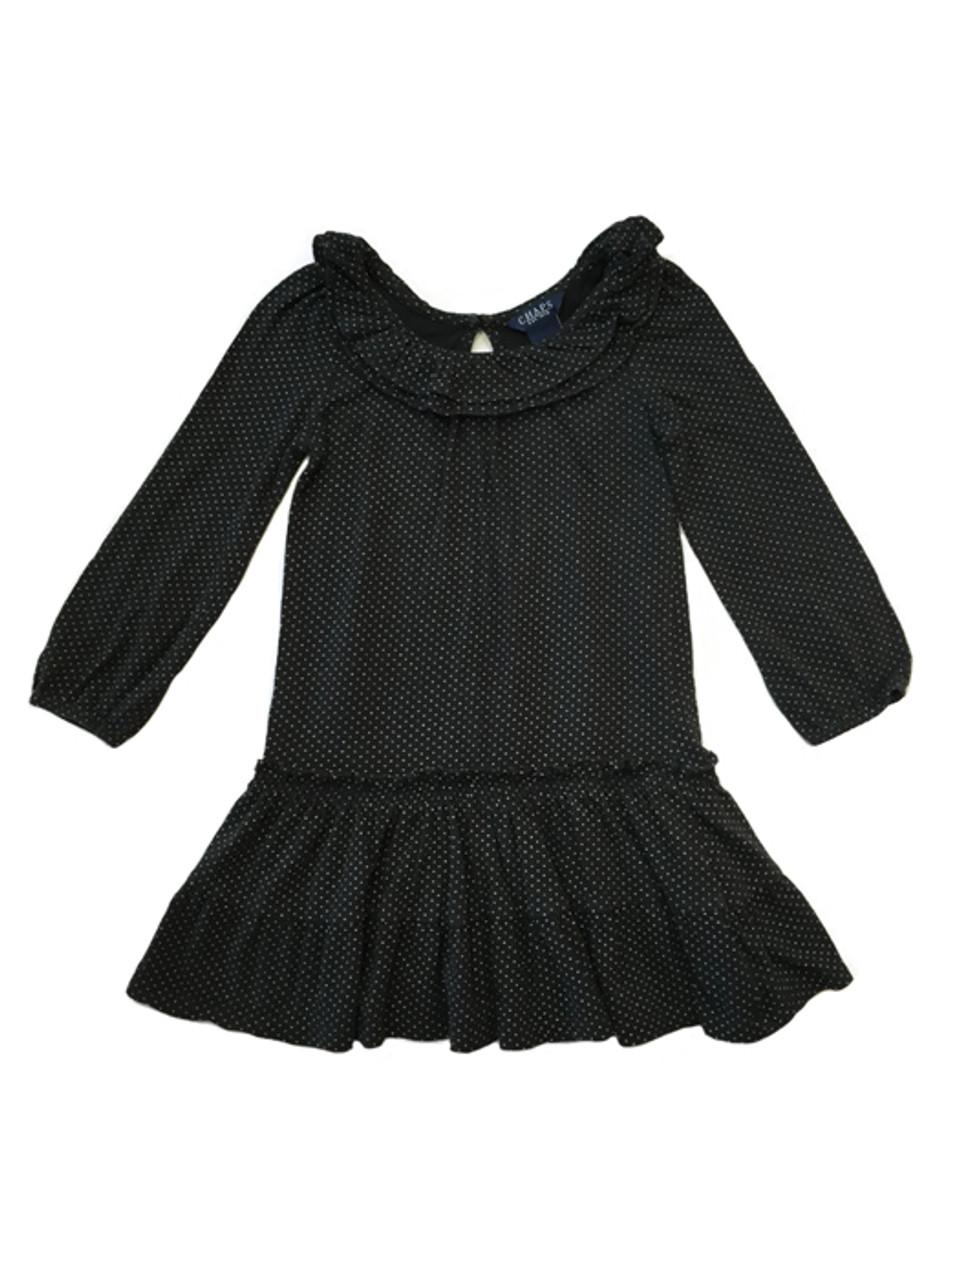 Chaps Toddler Girls Black Ruffle Dress Berri Kids Resale Boutique